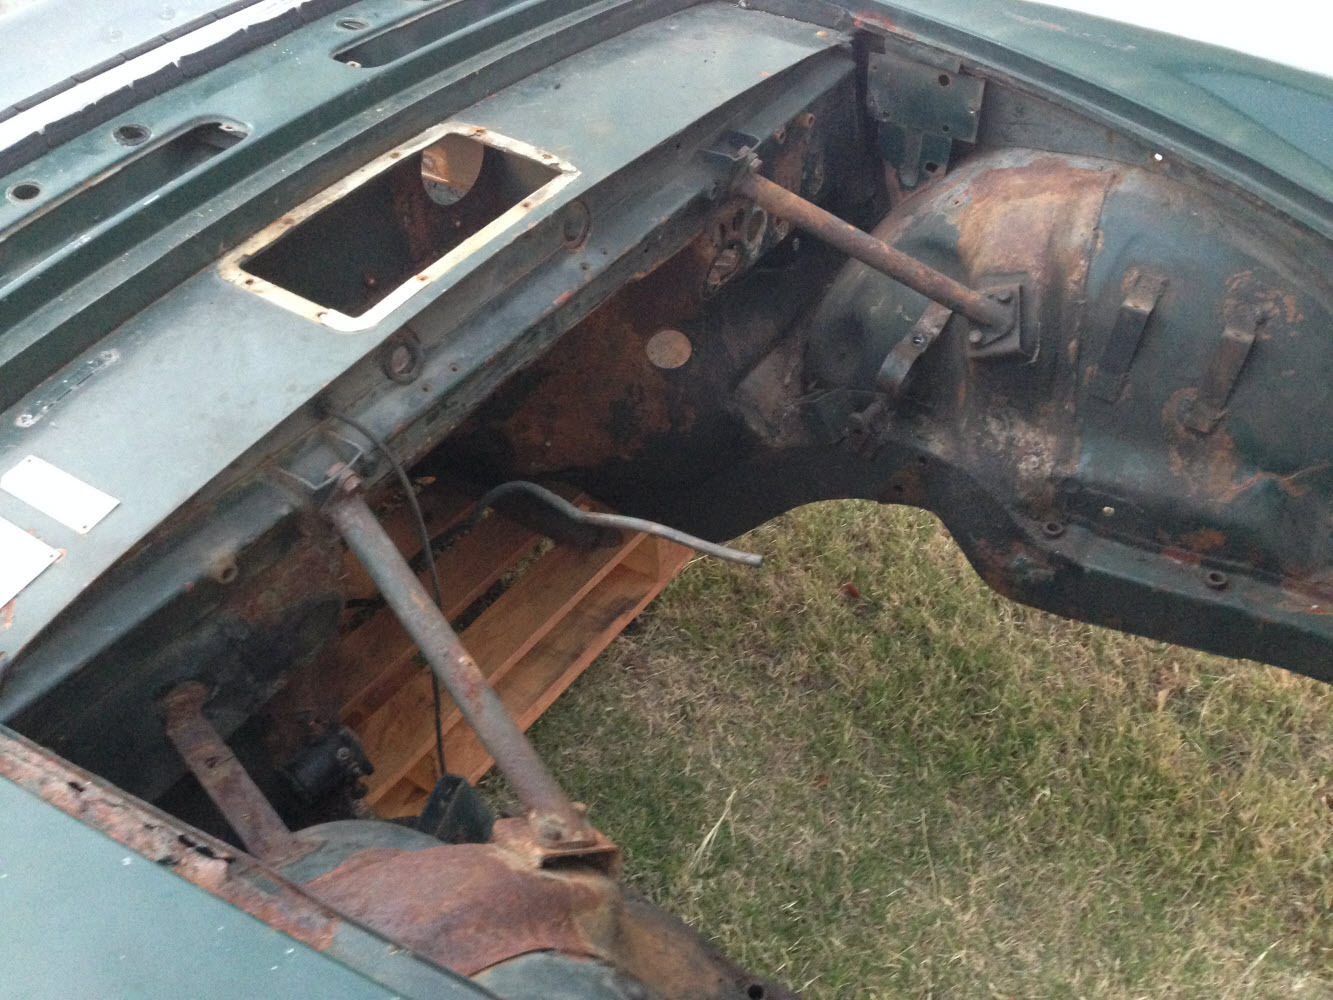 Sunbeam Tiger Parts Car Or Project on Car Hood Repair